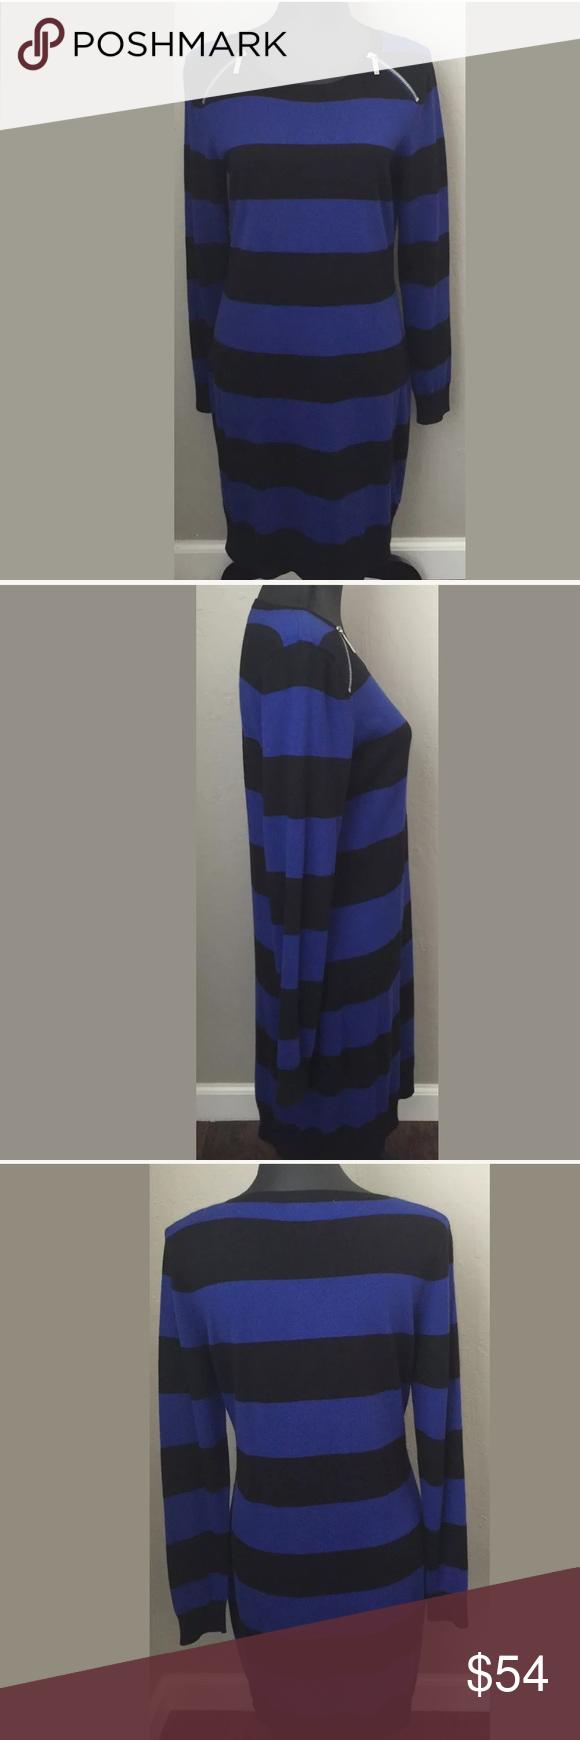 "Michael Kors size medium Knit sweater dress New with tags Michael Kors size medium Knit sweater dress. Long sleeve, knee length, zipper detail at shoulders, Lightweight, soft. Cotton/nylon/Rayon. Blue and Black stripe. Bust 18"" armpit to armpit. Waist 16"" side to side. Hips 18"" side to side.Length 36"" shoulder to hem. Sleeve 26"" Measurements are approximate. MSRP $130 Michael Kors Dresses"